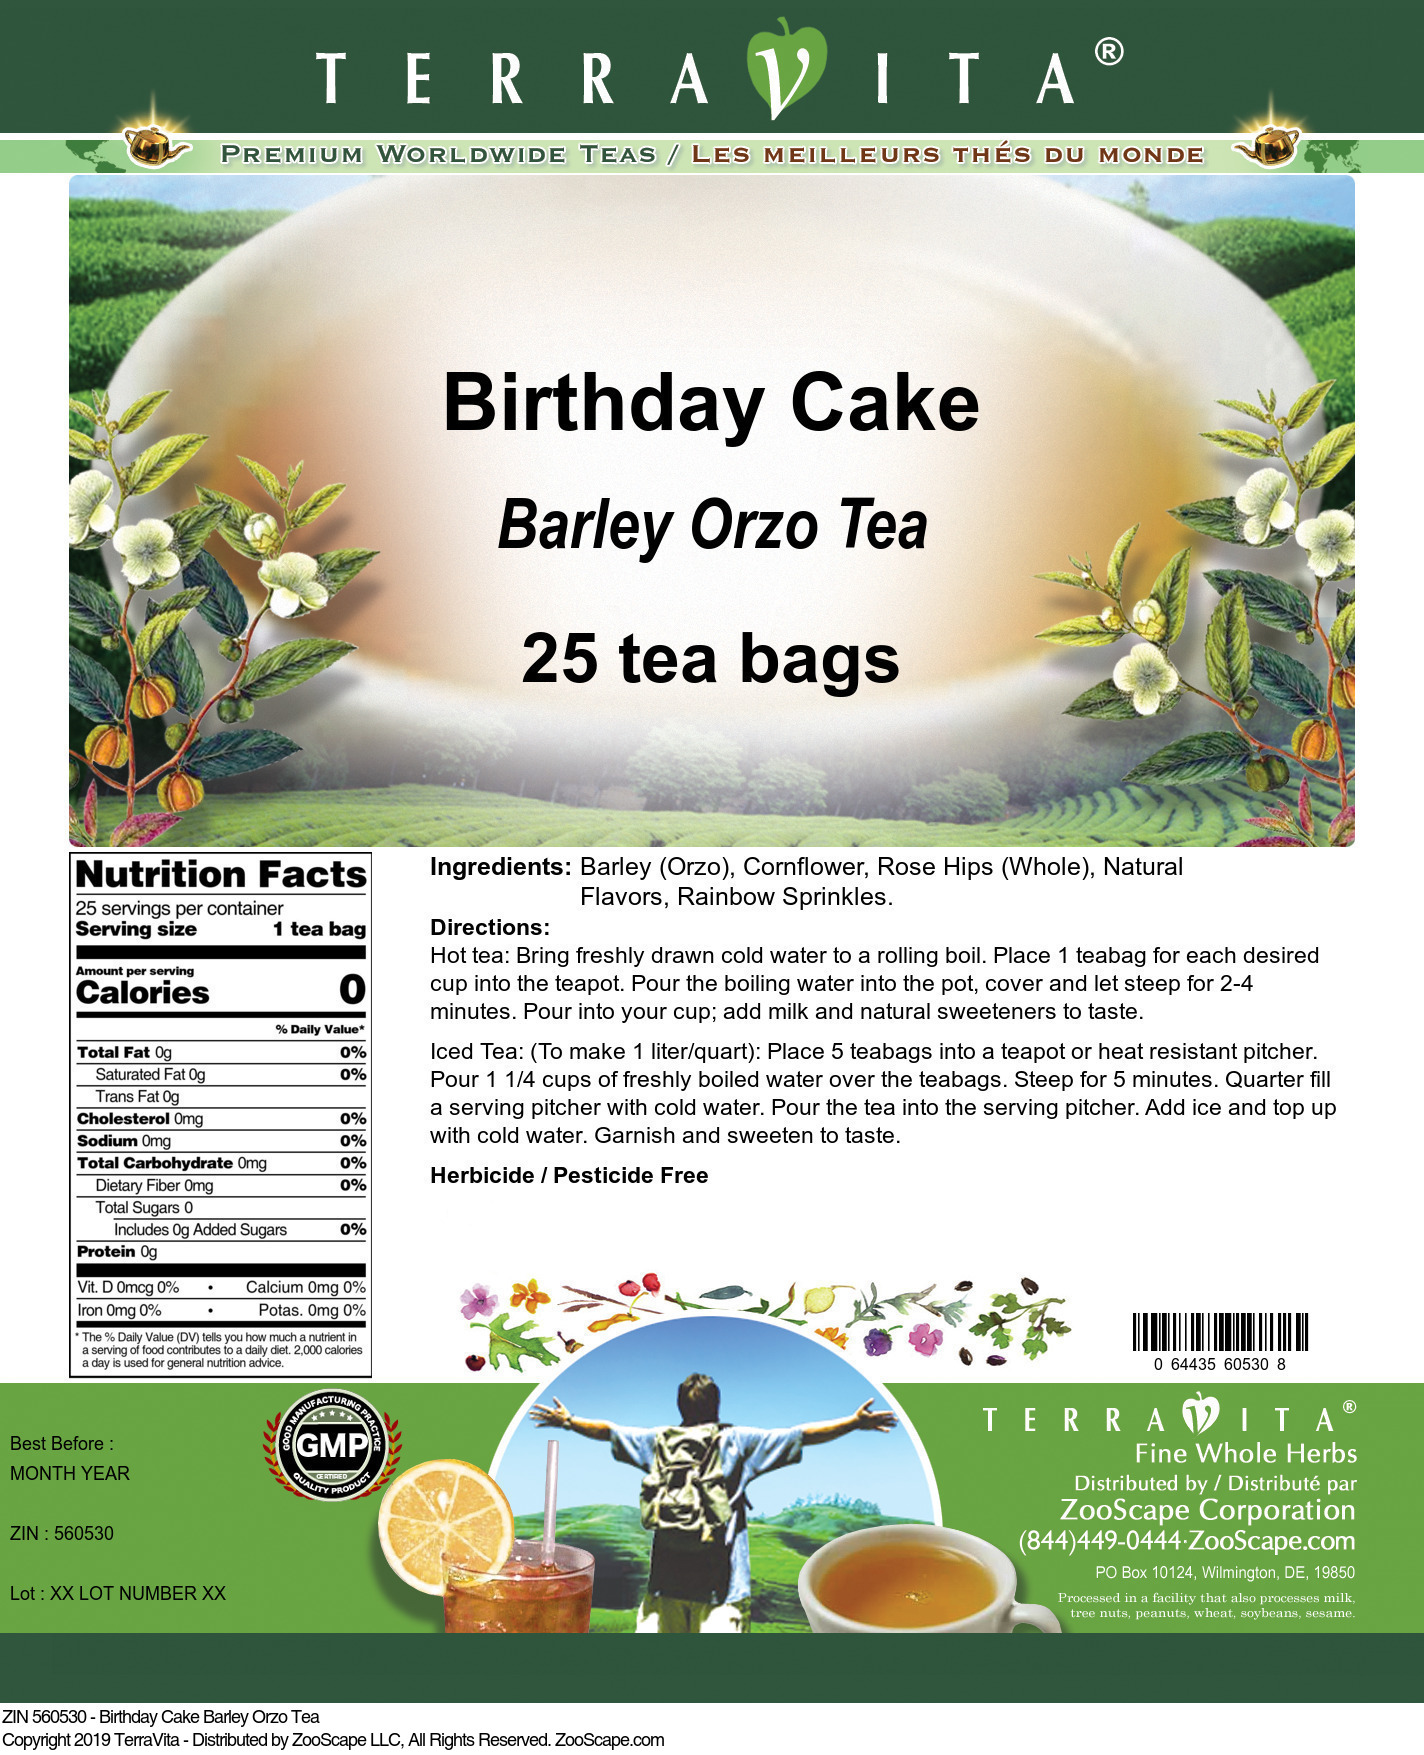 Birthday Cake Barley Orzo